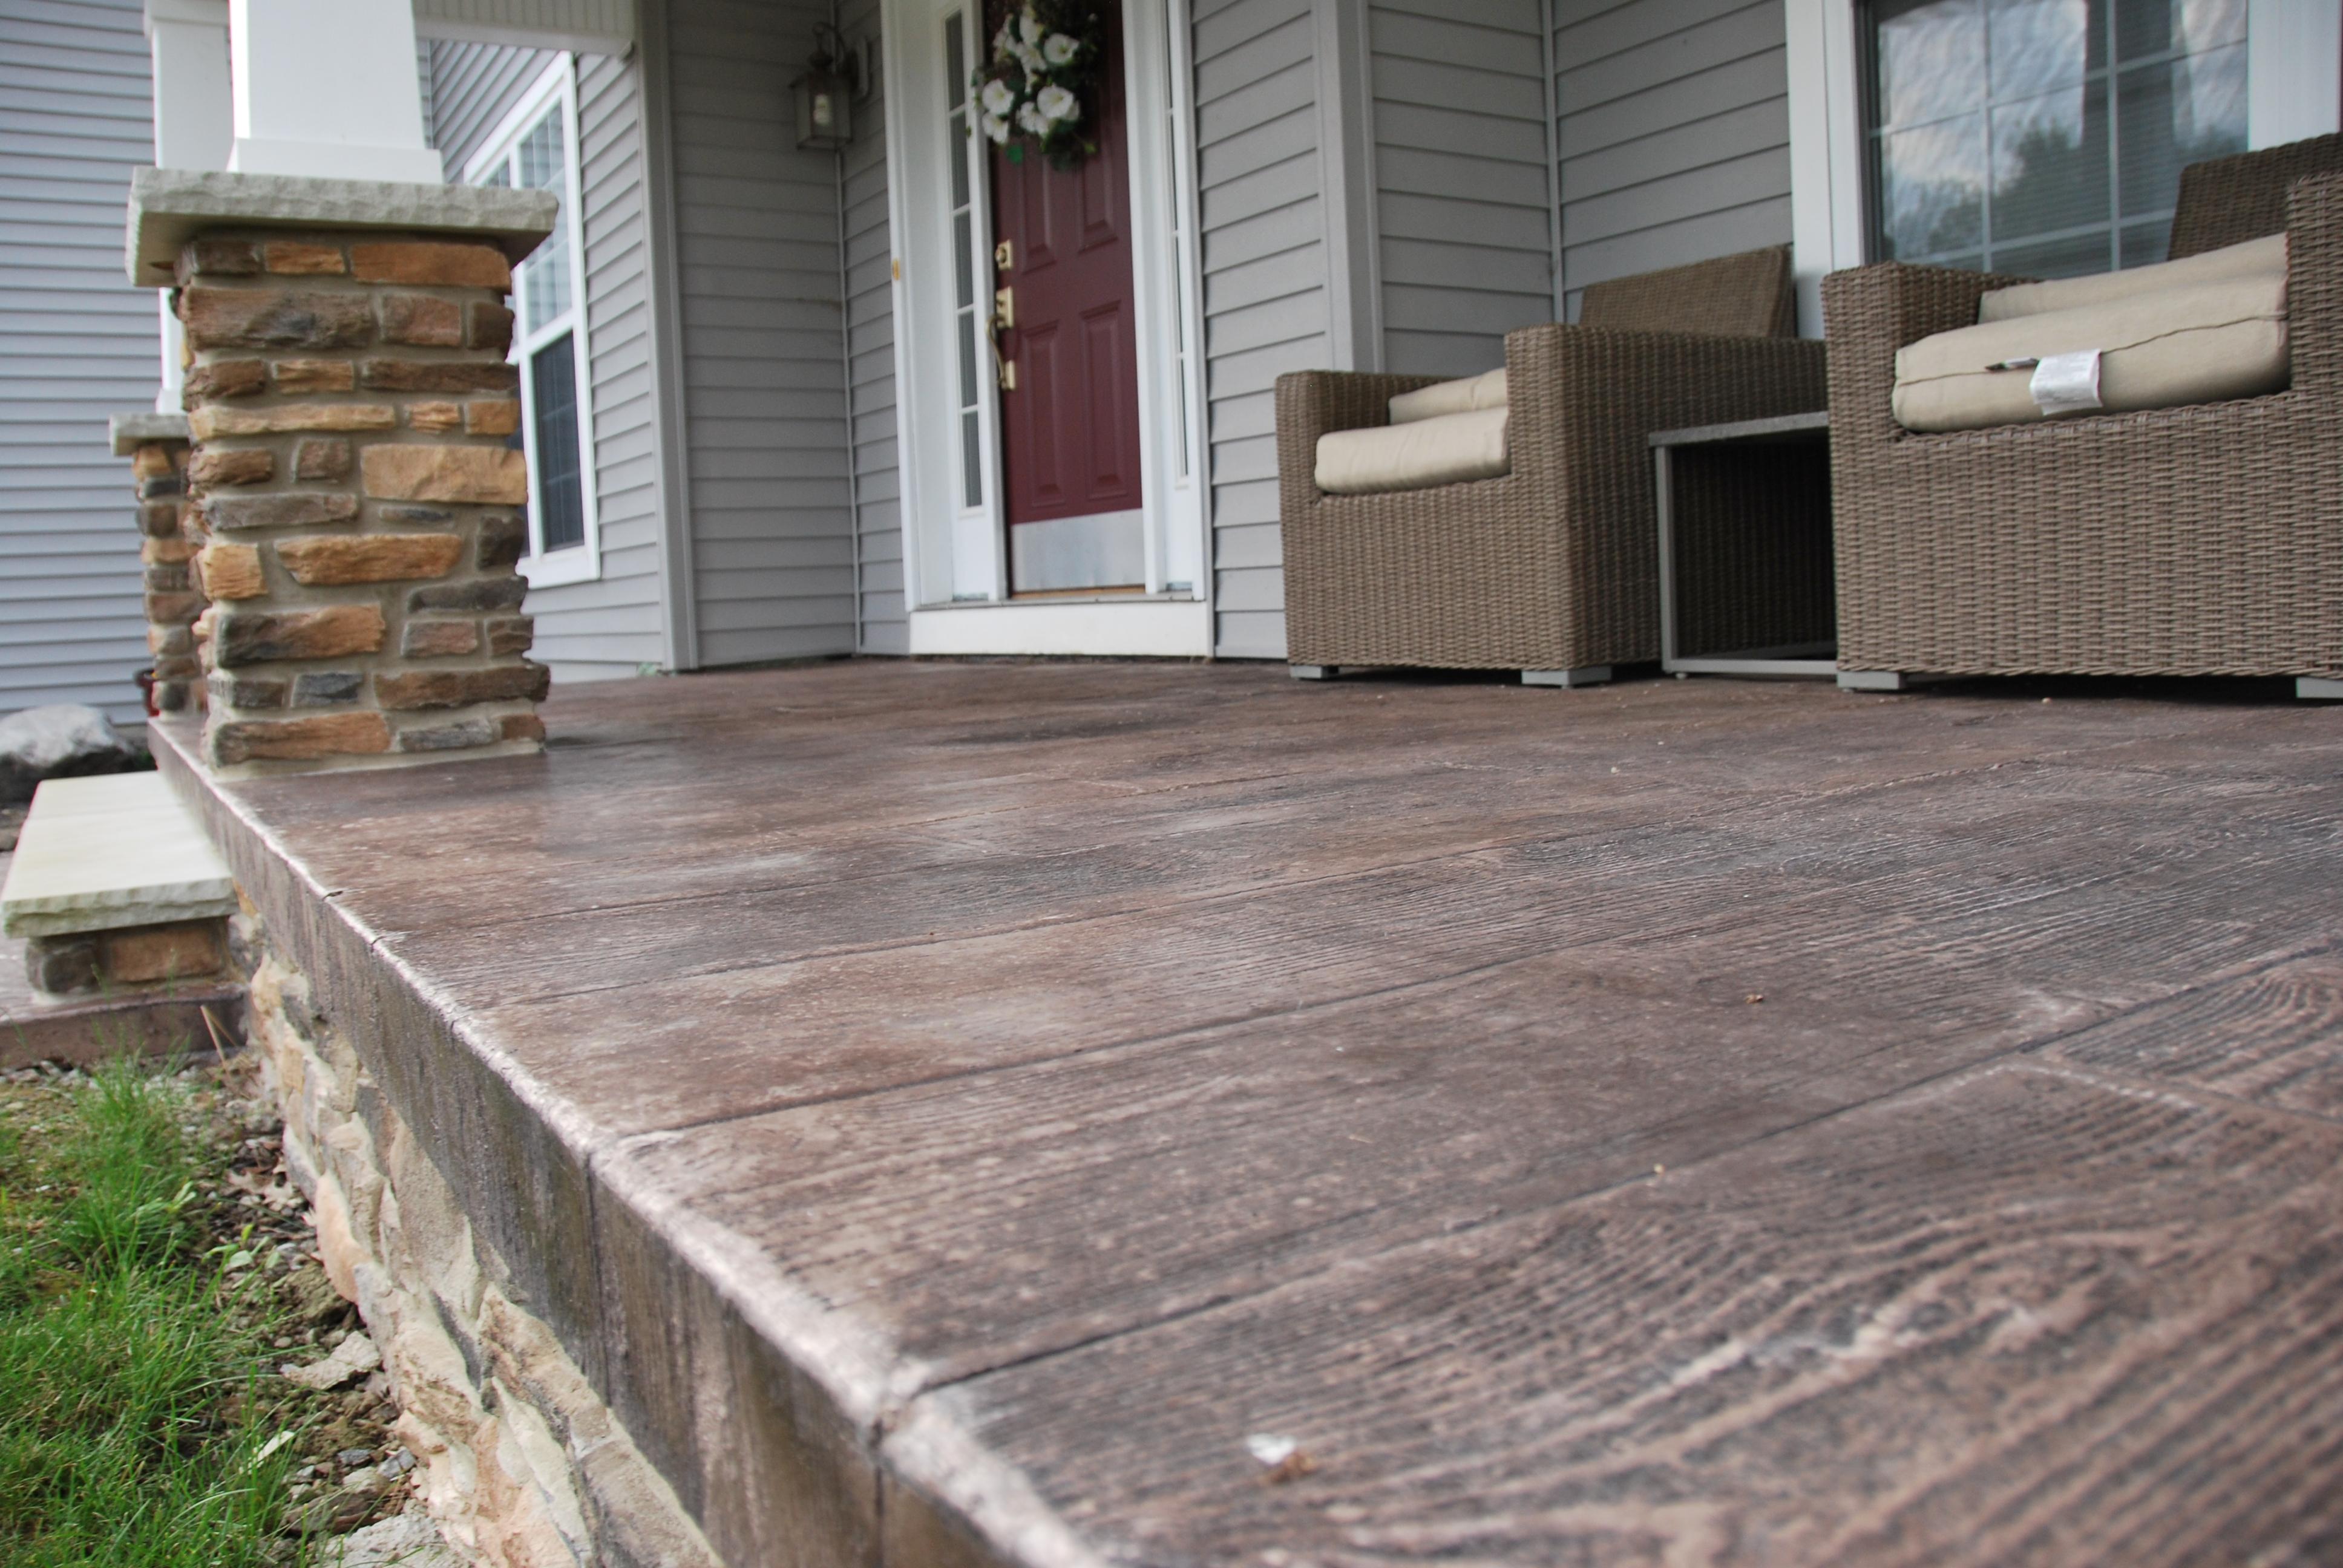 pebble-porch-3